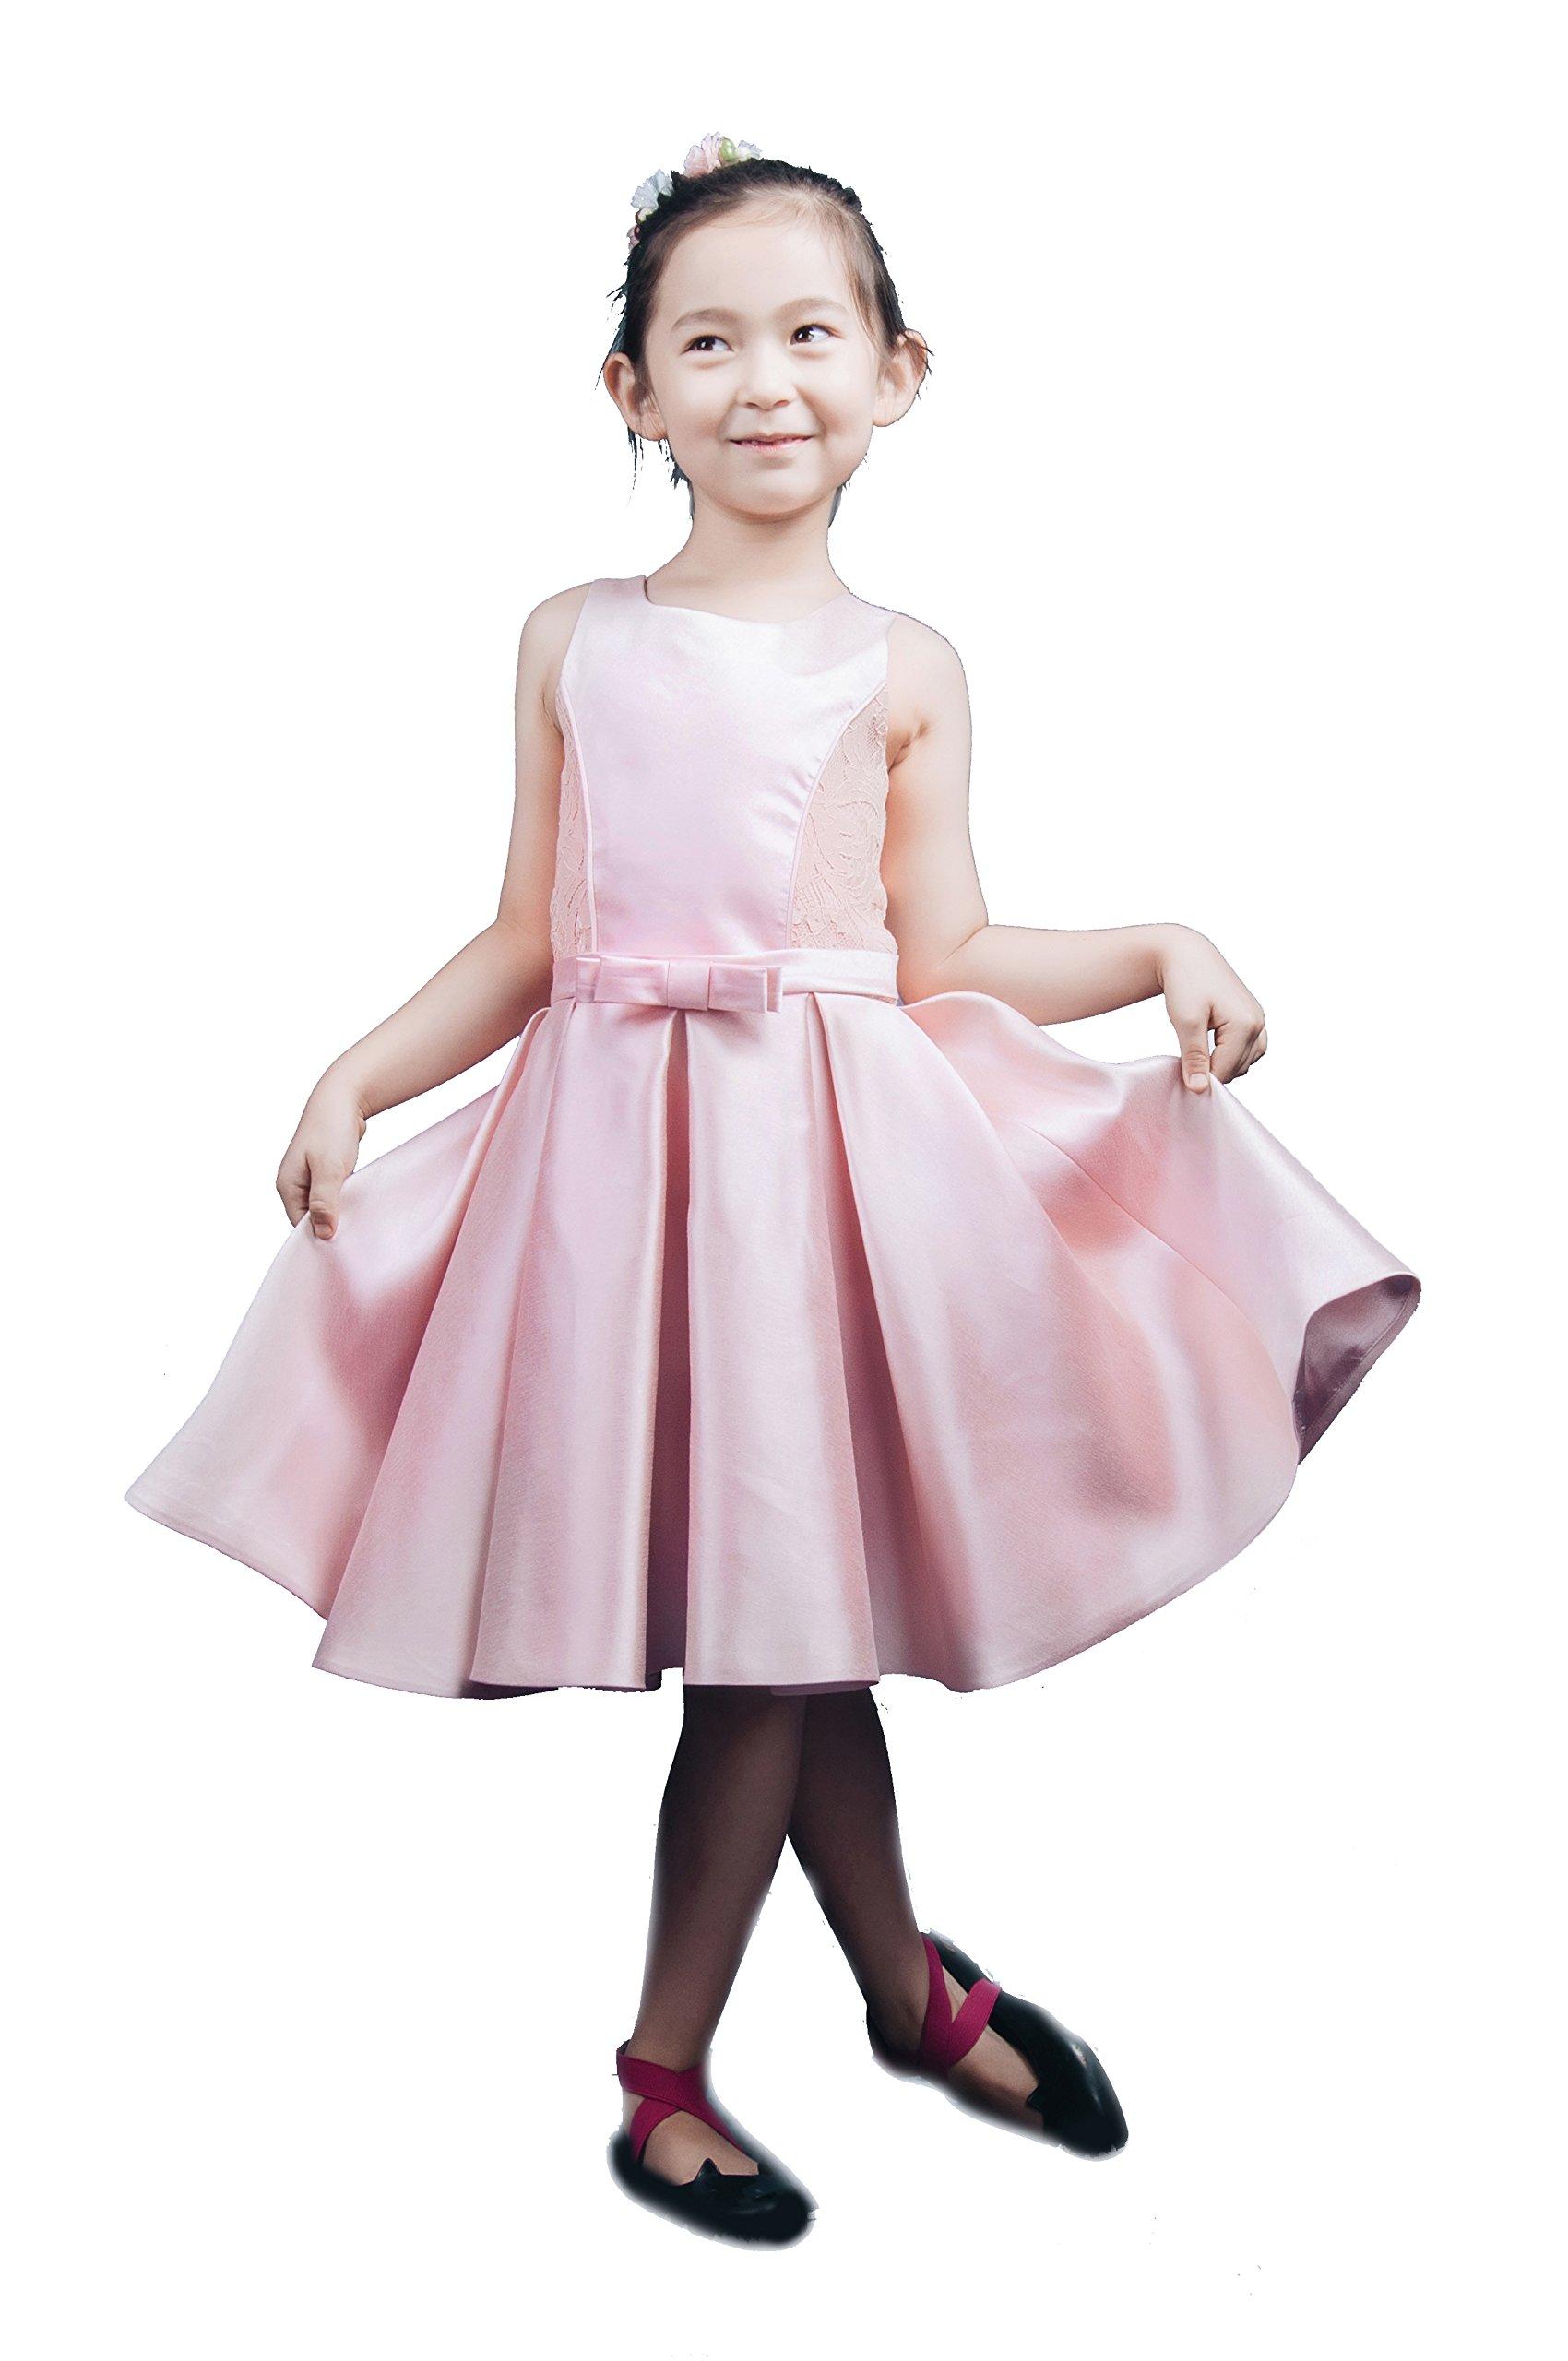 Saint Toi Lovely Mini Satin Flower Girl Princess Dress with Bow TLSCS-0014 by Saint Toi